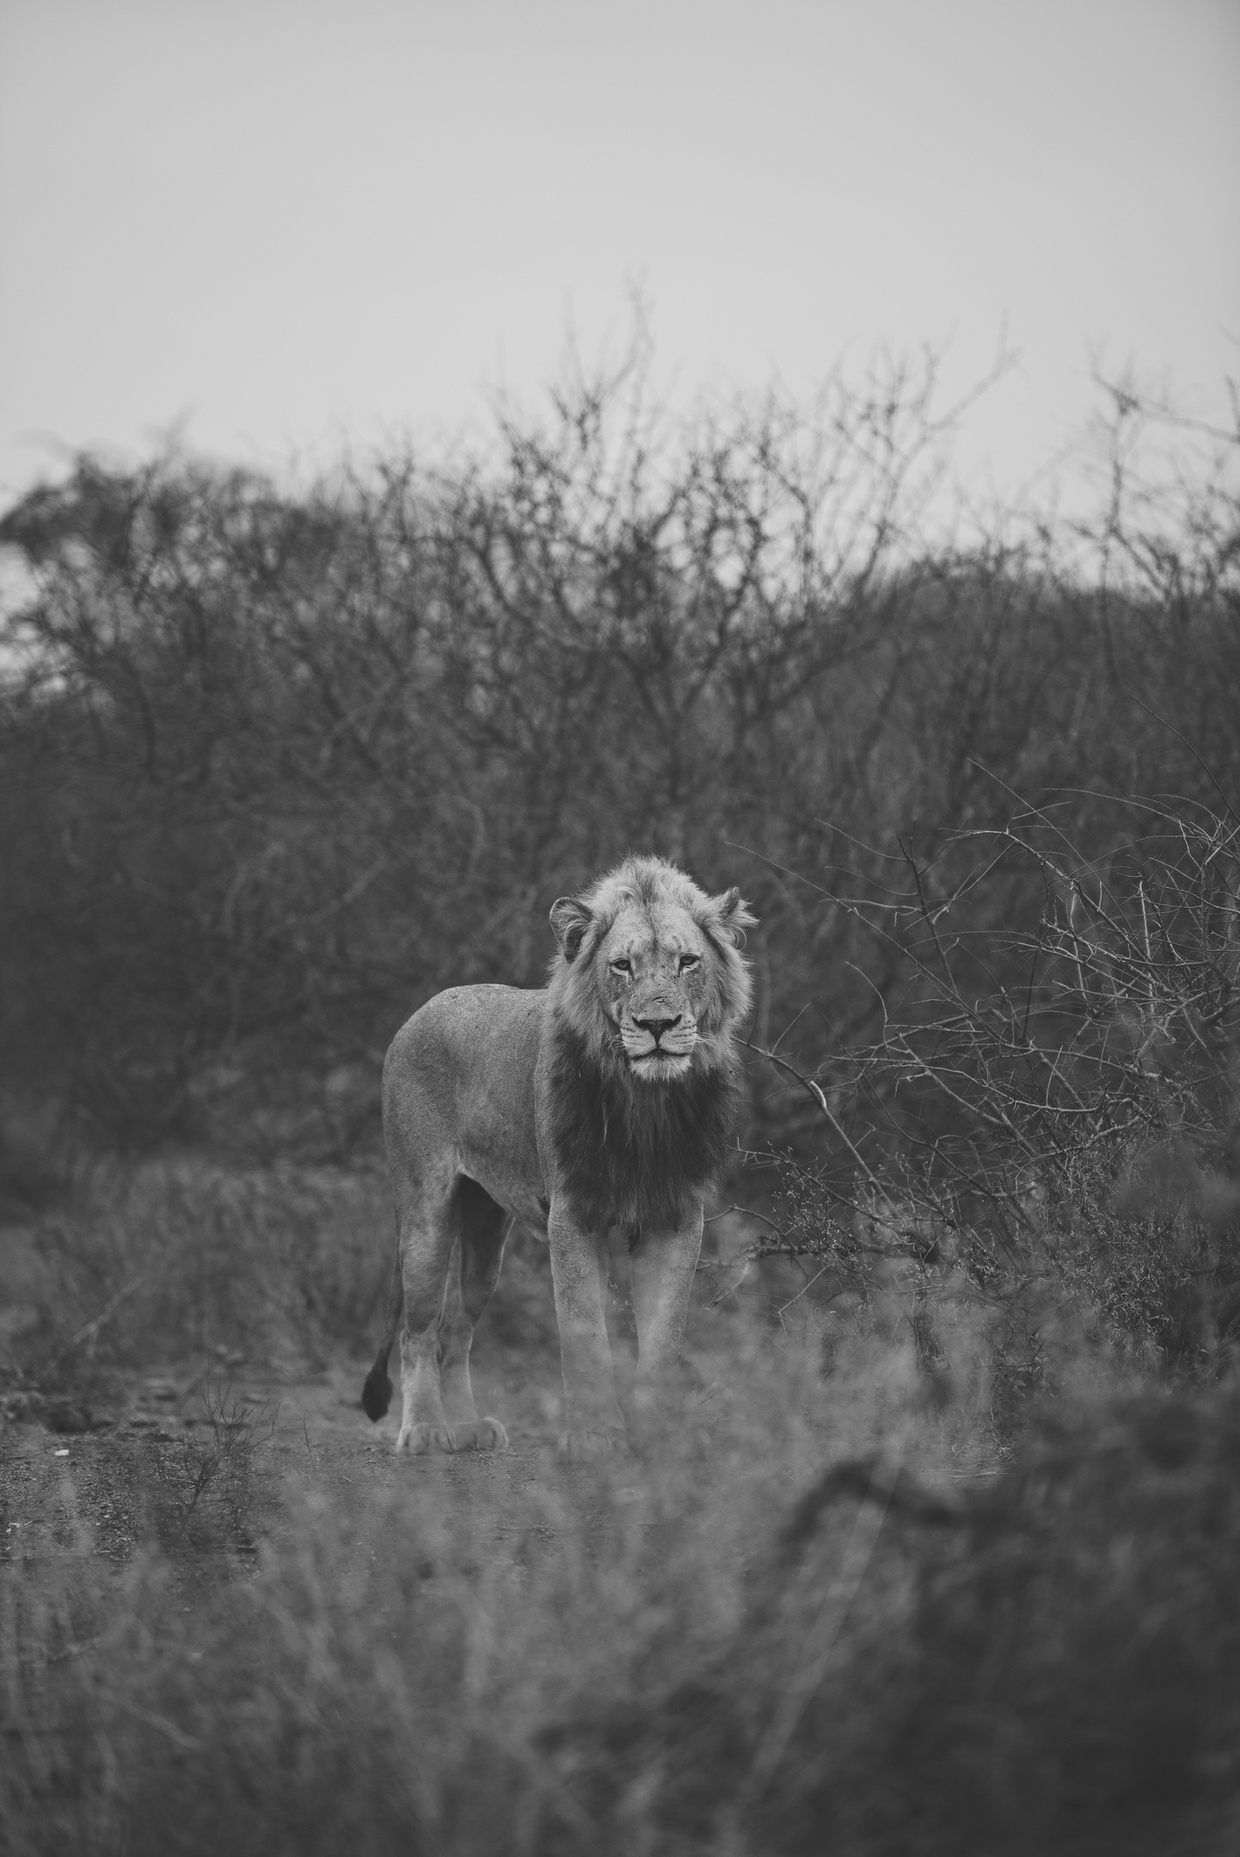 Safari 2 - Lion